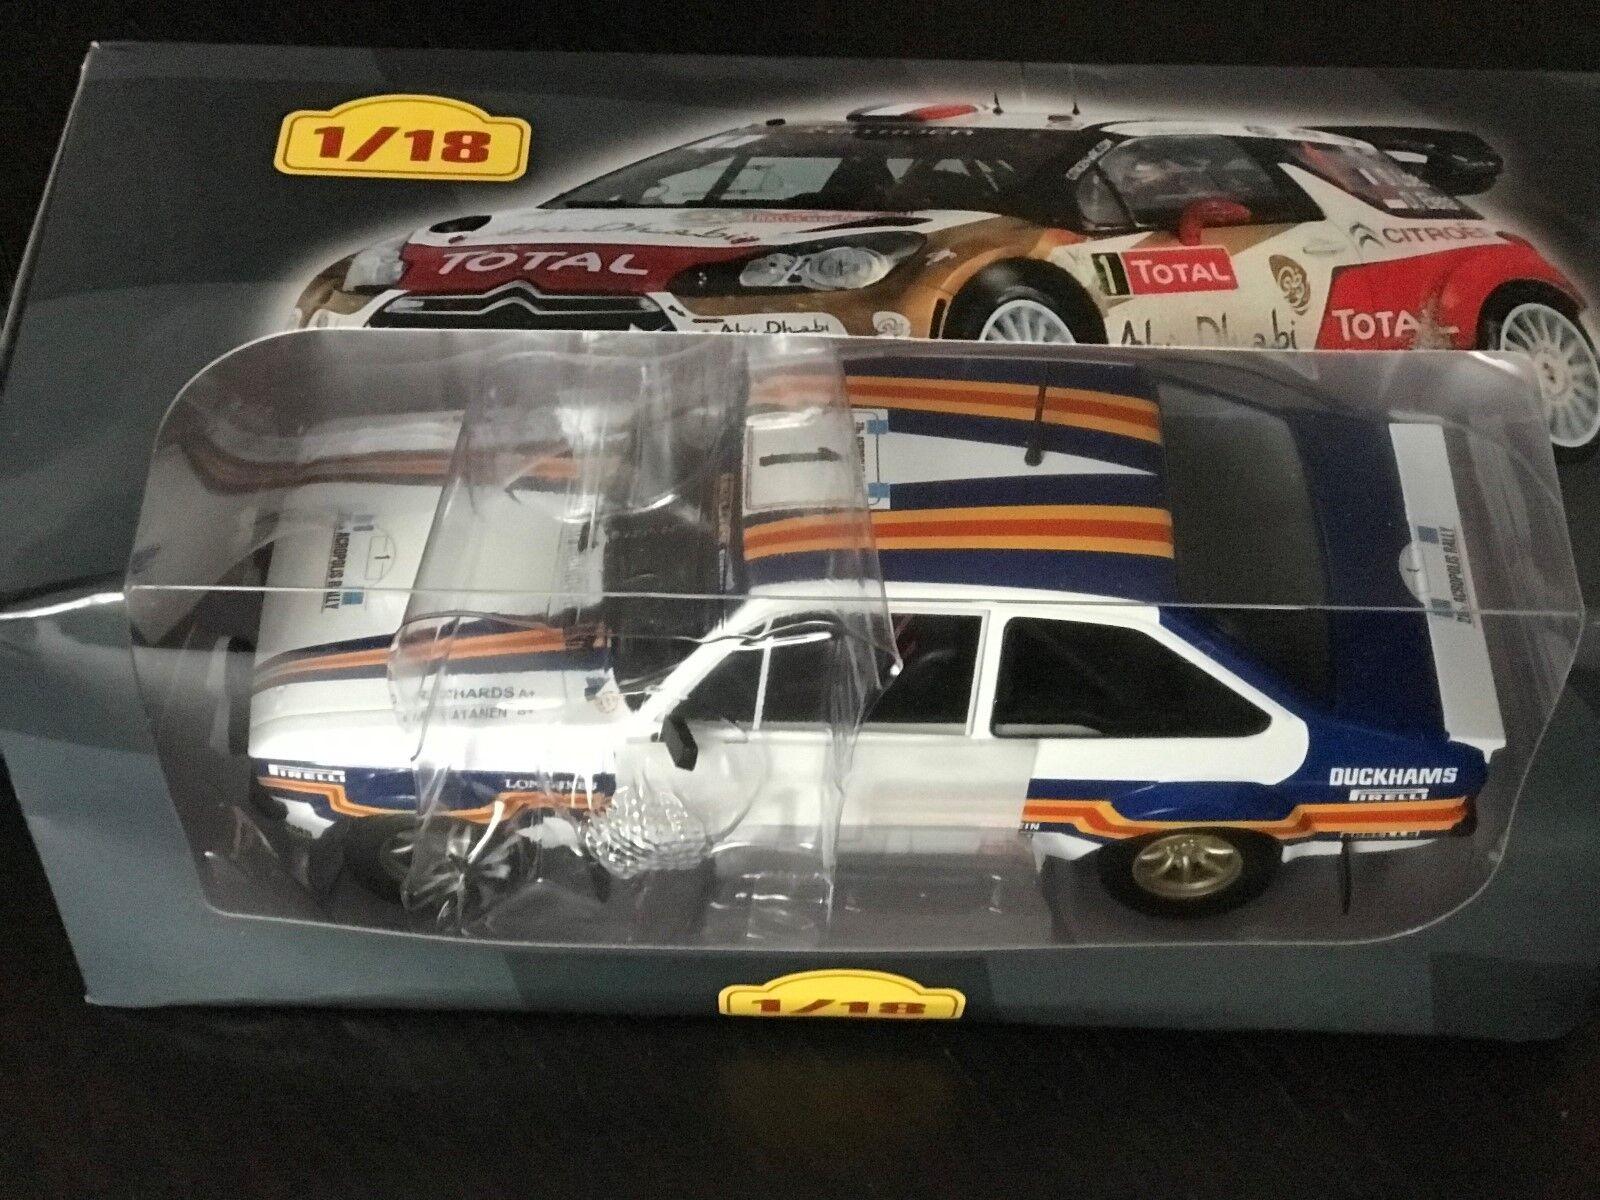 Ford Escort Rs 1800 Mk II 1981 Agence Vatanen Rally - Ixo Altaya 1 18 (EB26)